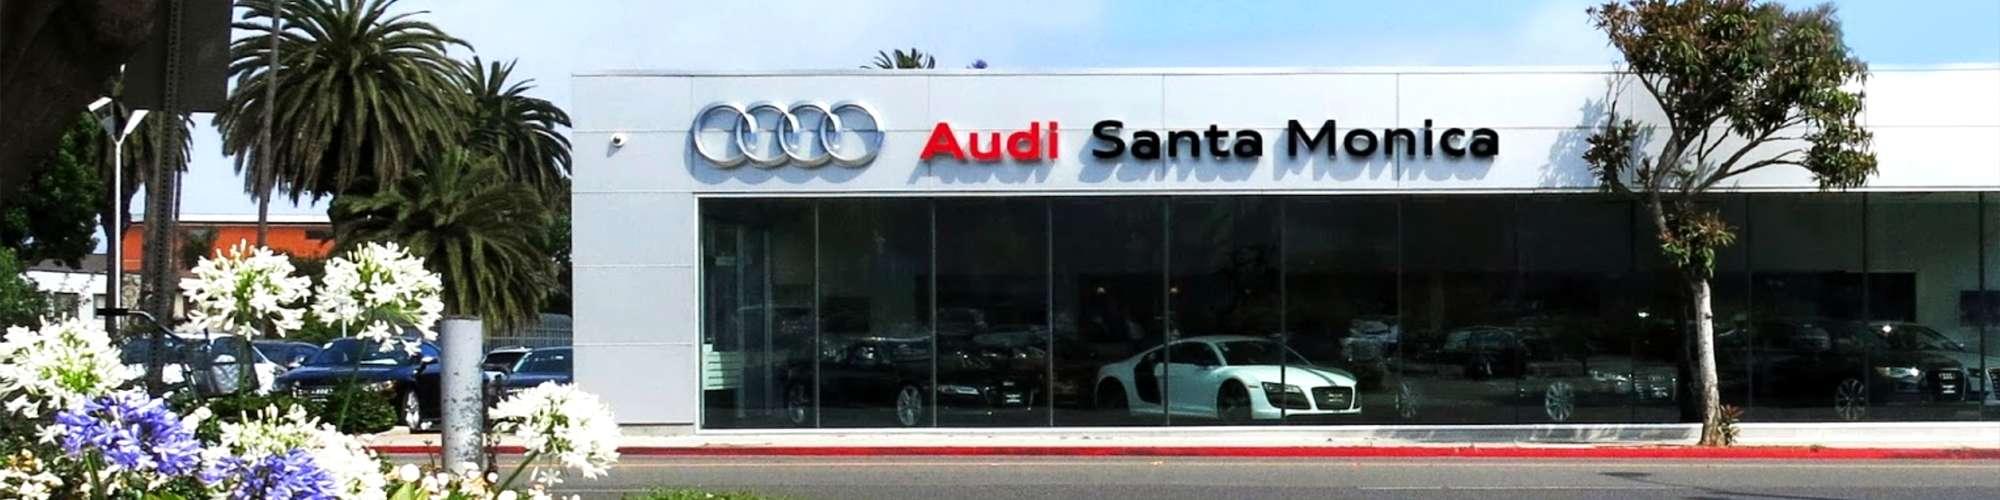 Santa Monica Audi - New and Used Car Dealer Serving LA